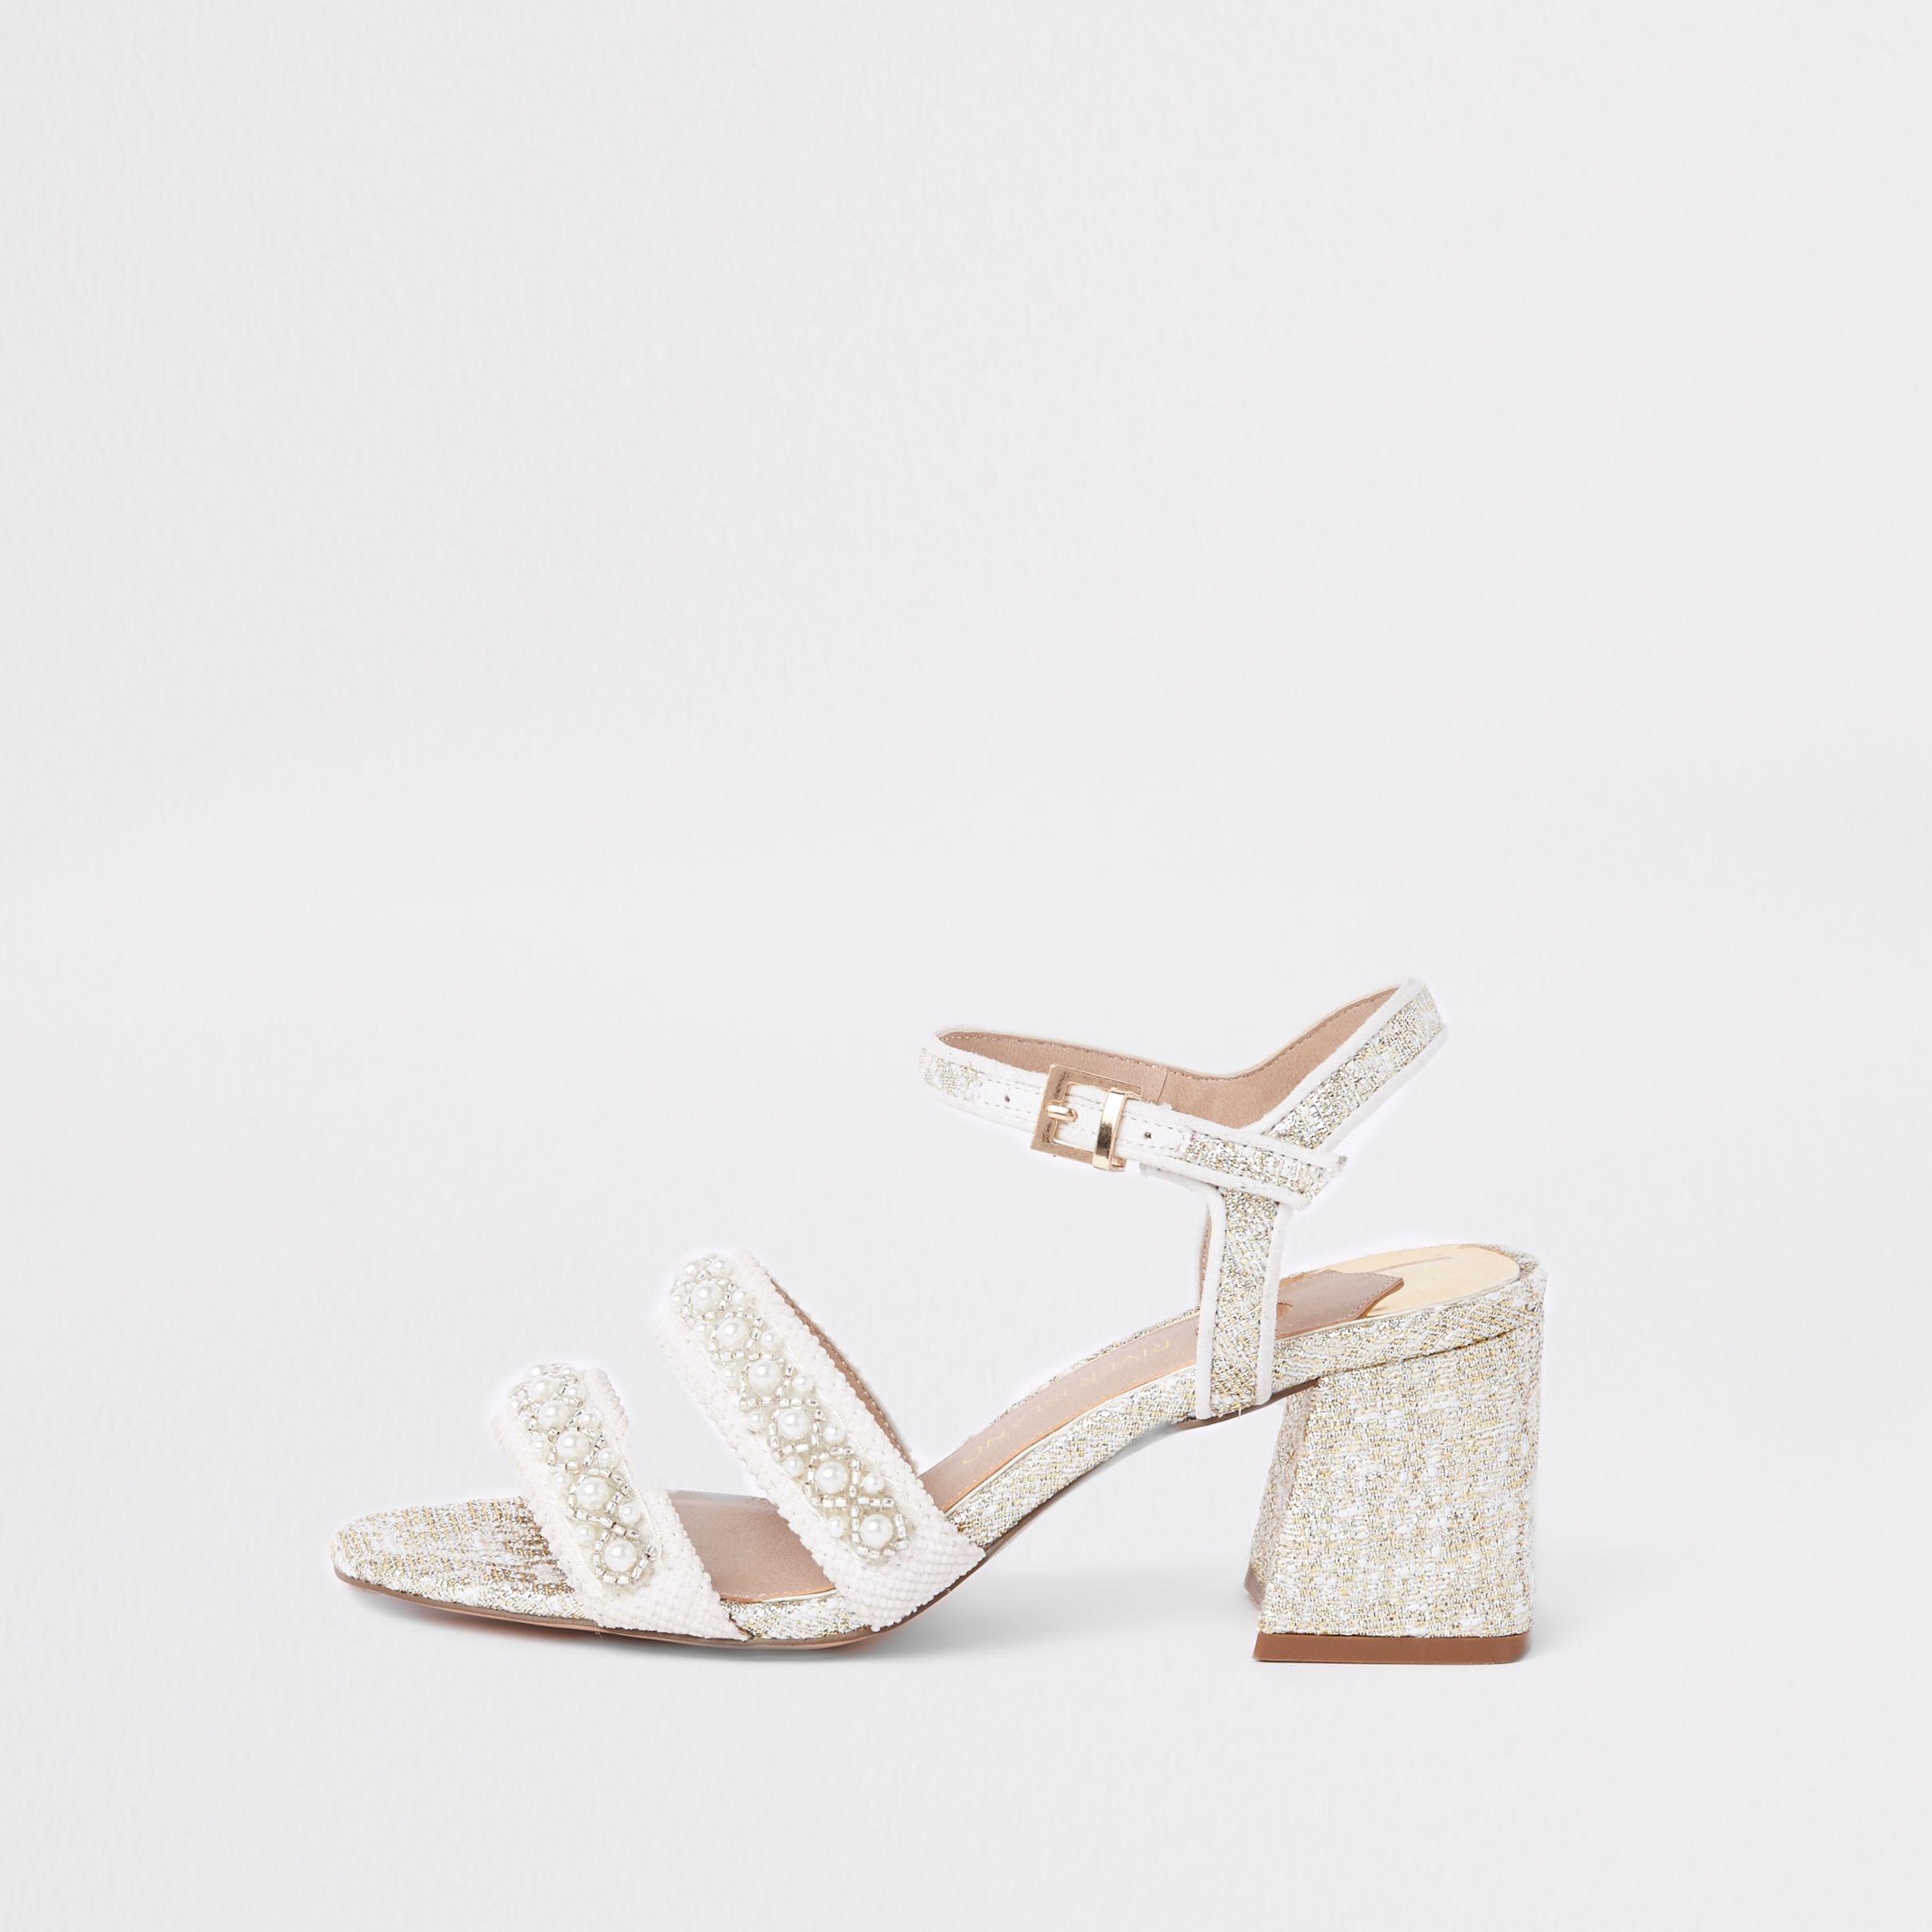 138cc48834b Lyst - River Island White Textile Pearl Block Heel Sandals in White